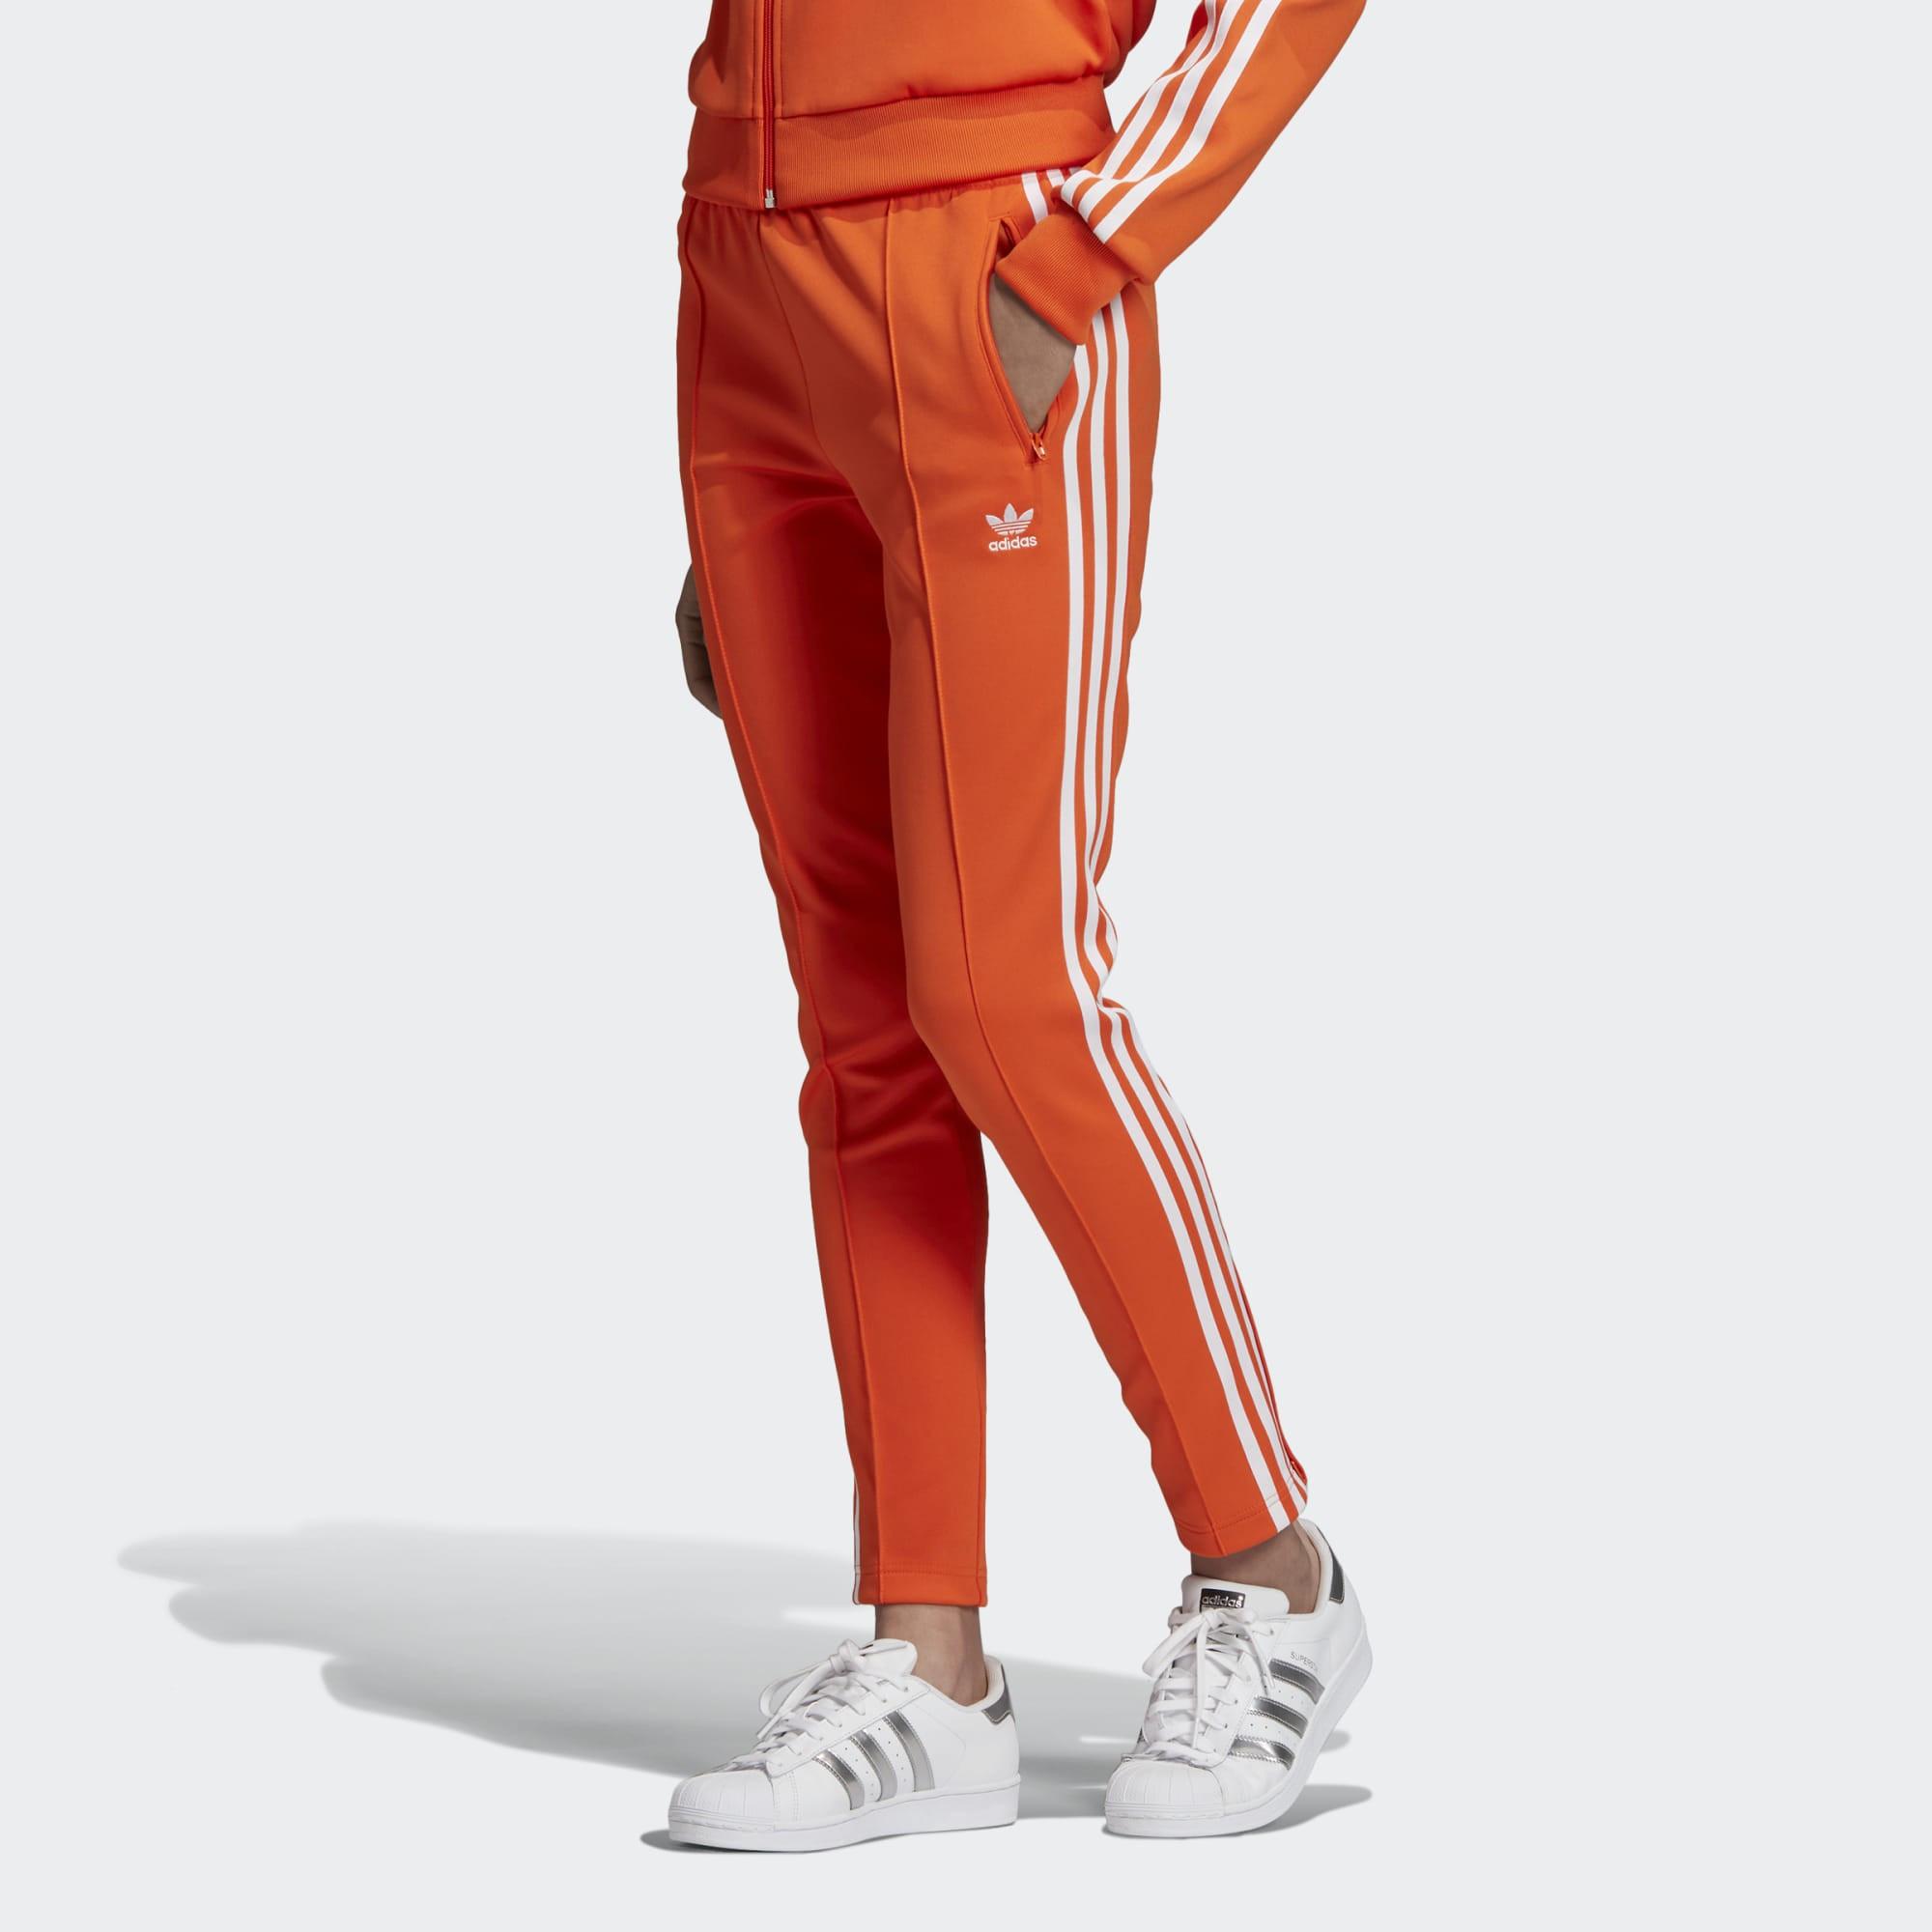 adidas Originals 3-Stripes Track Pants (9000031697_3236)